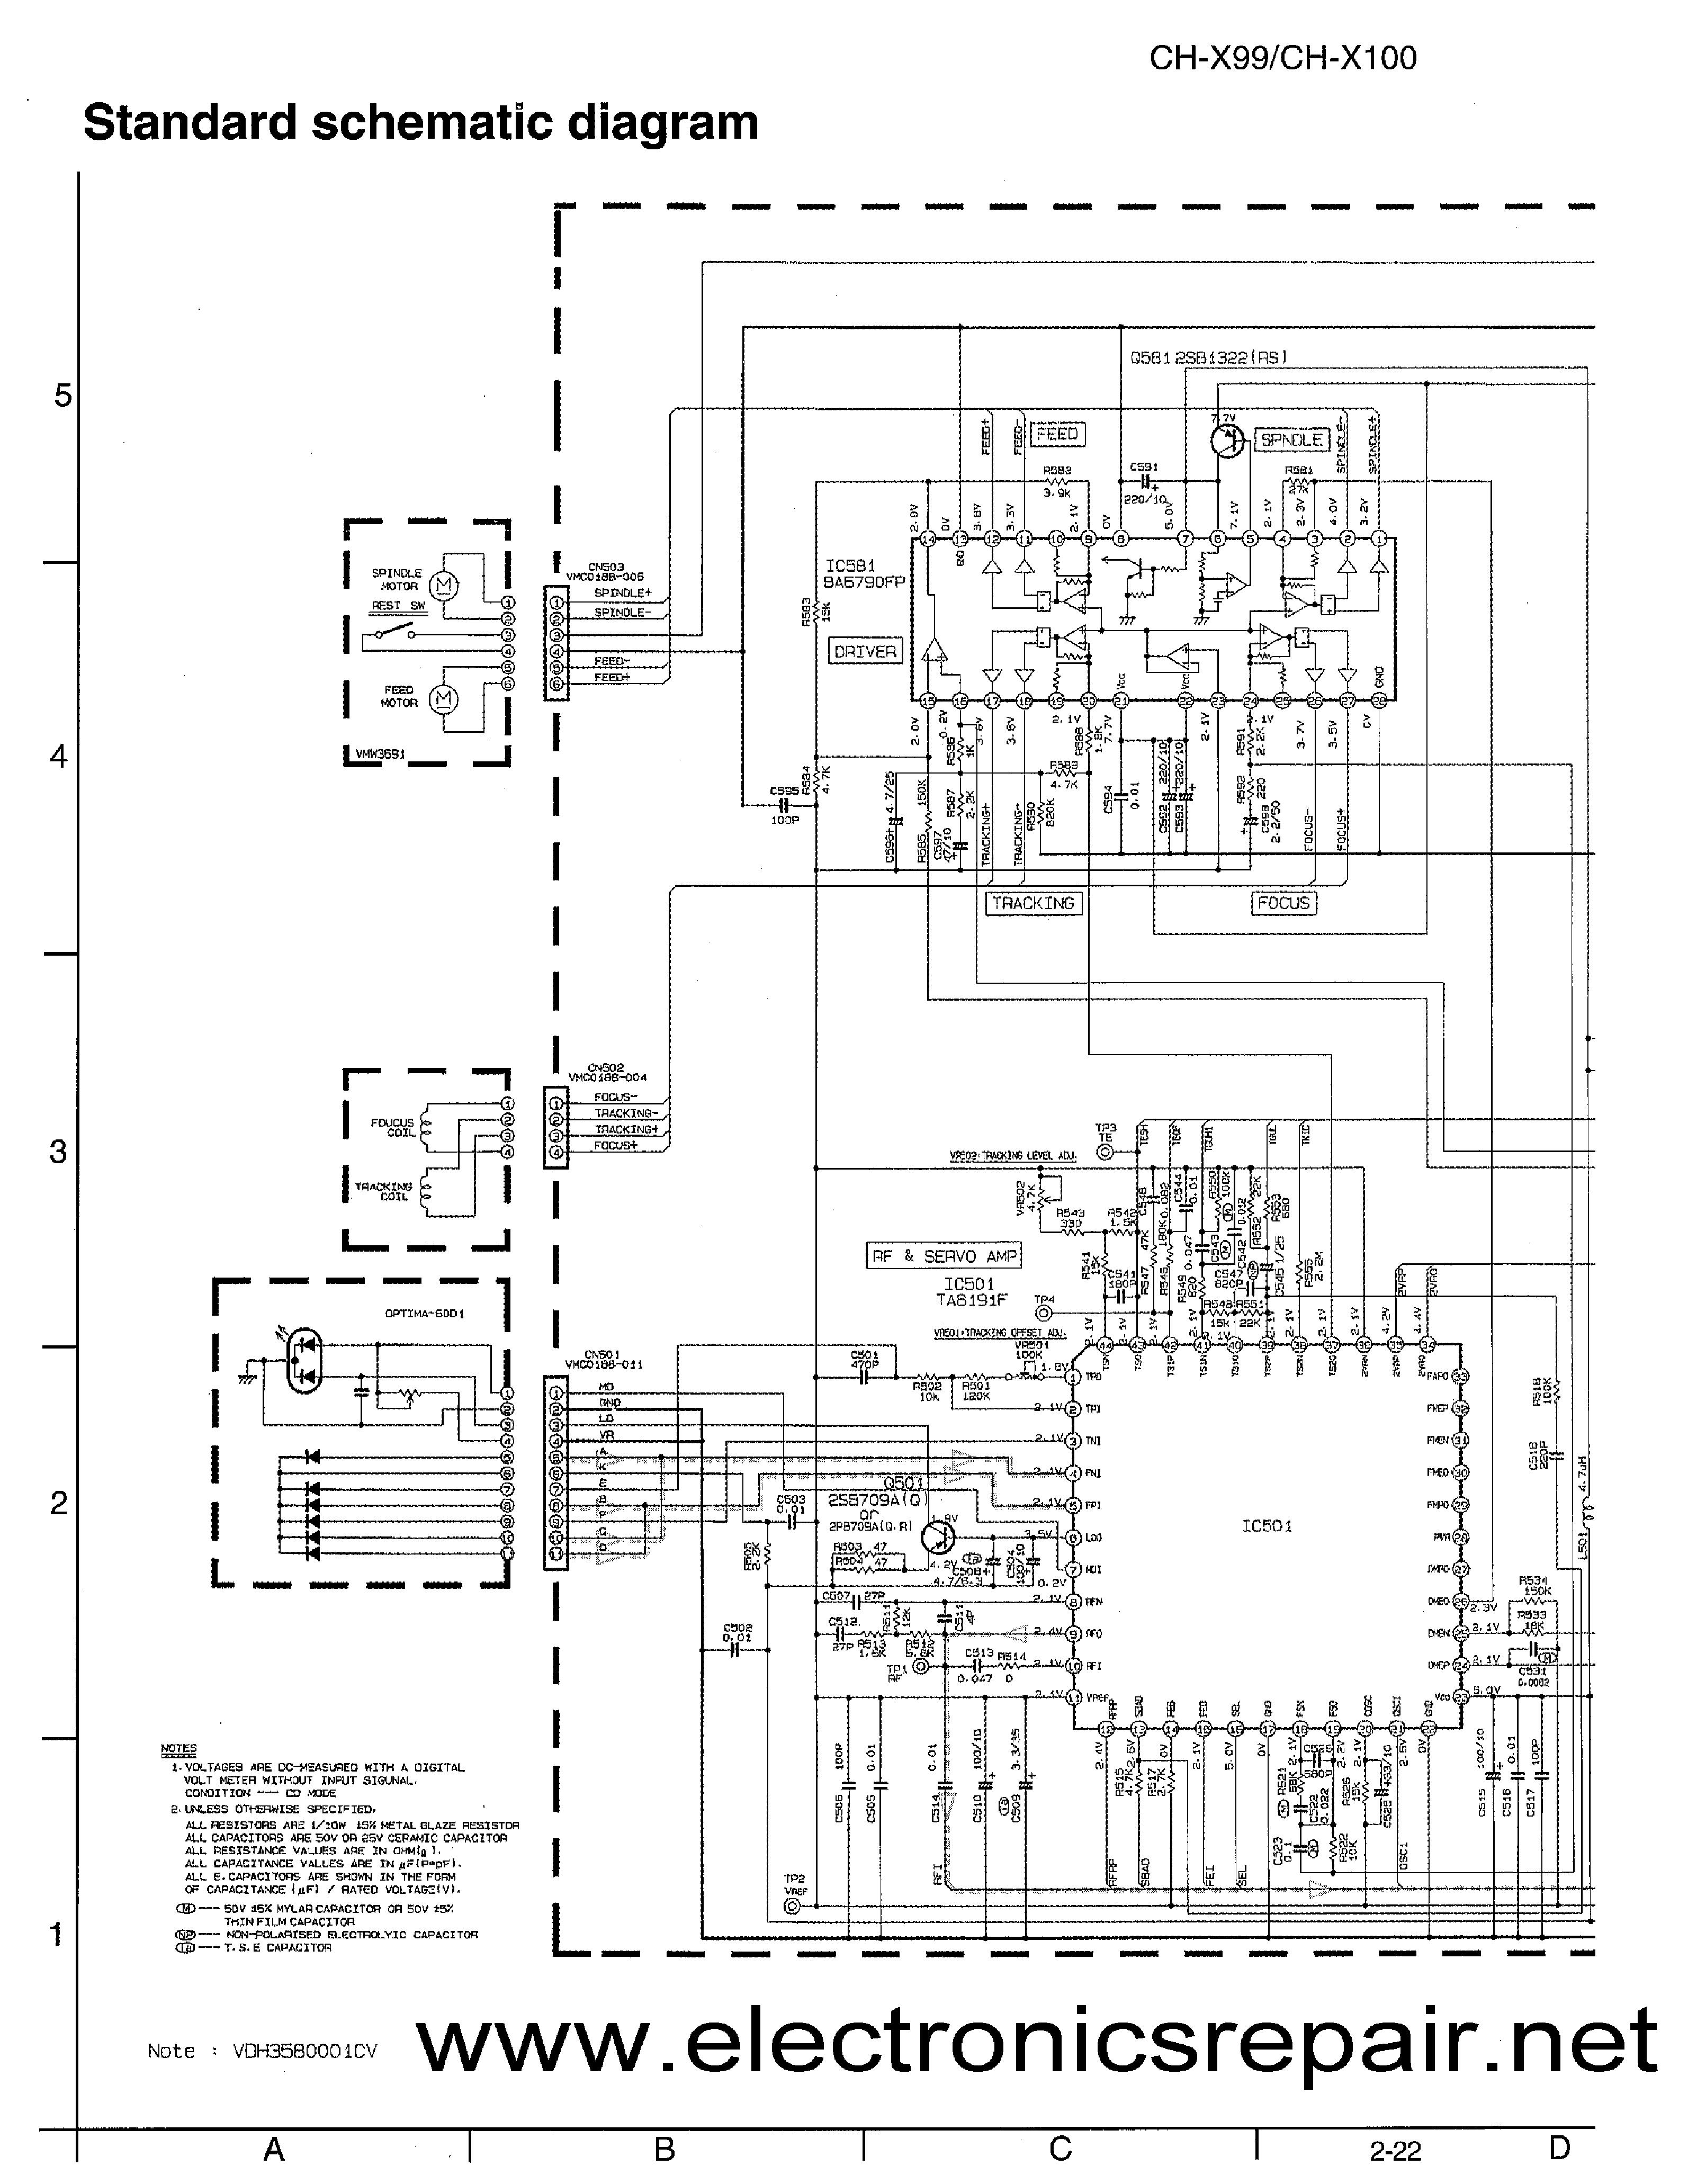 Jvc Wiring Ch 100. Wiring Diagram Images Database. amornsak.co